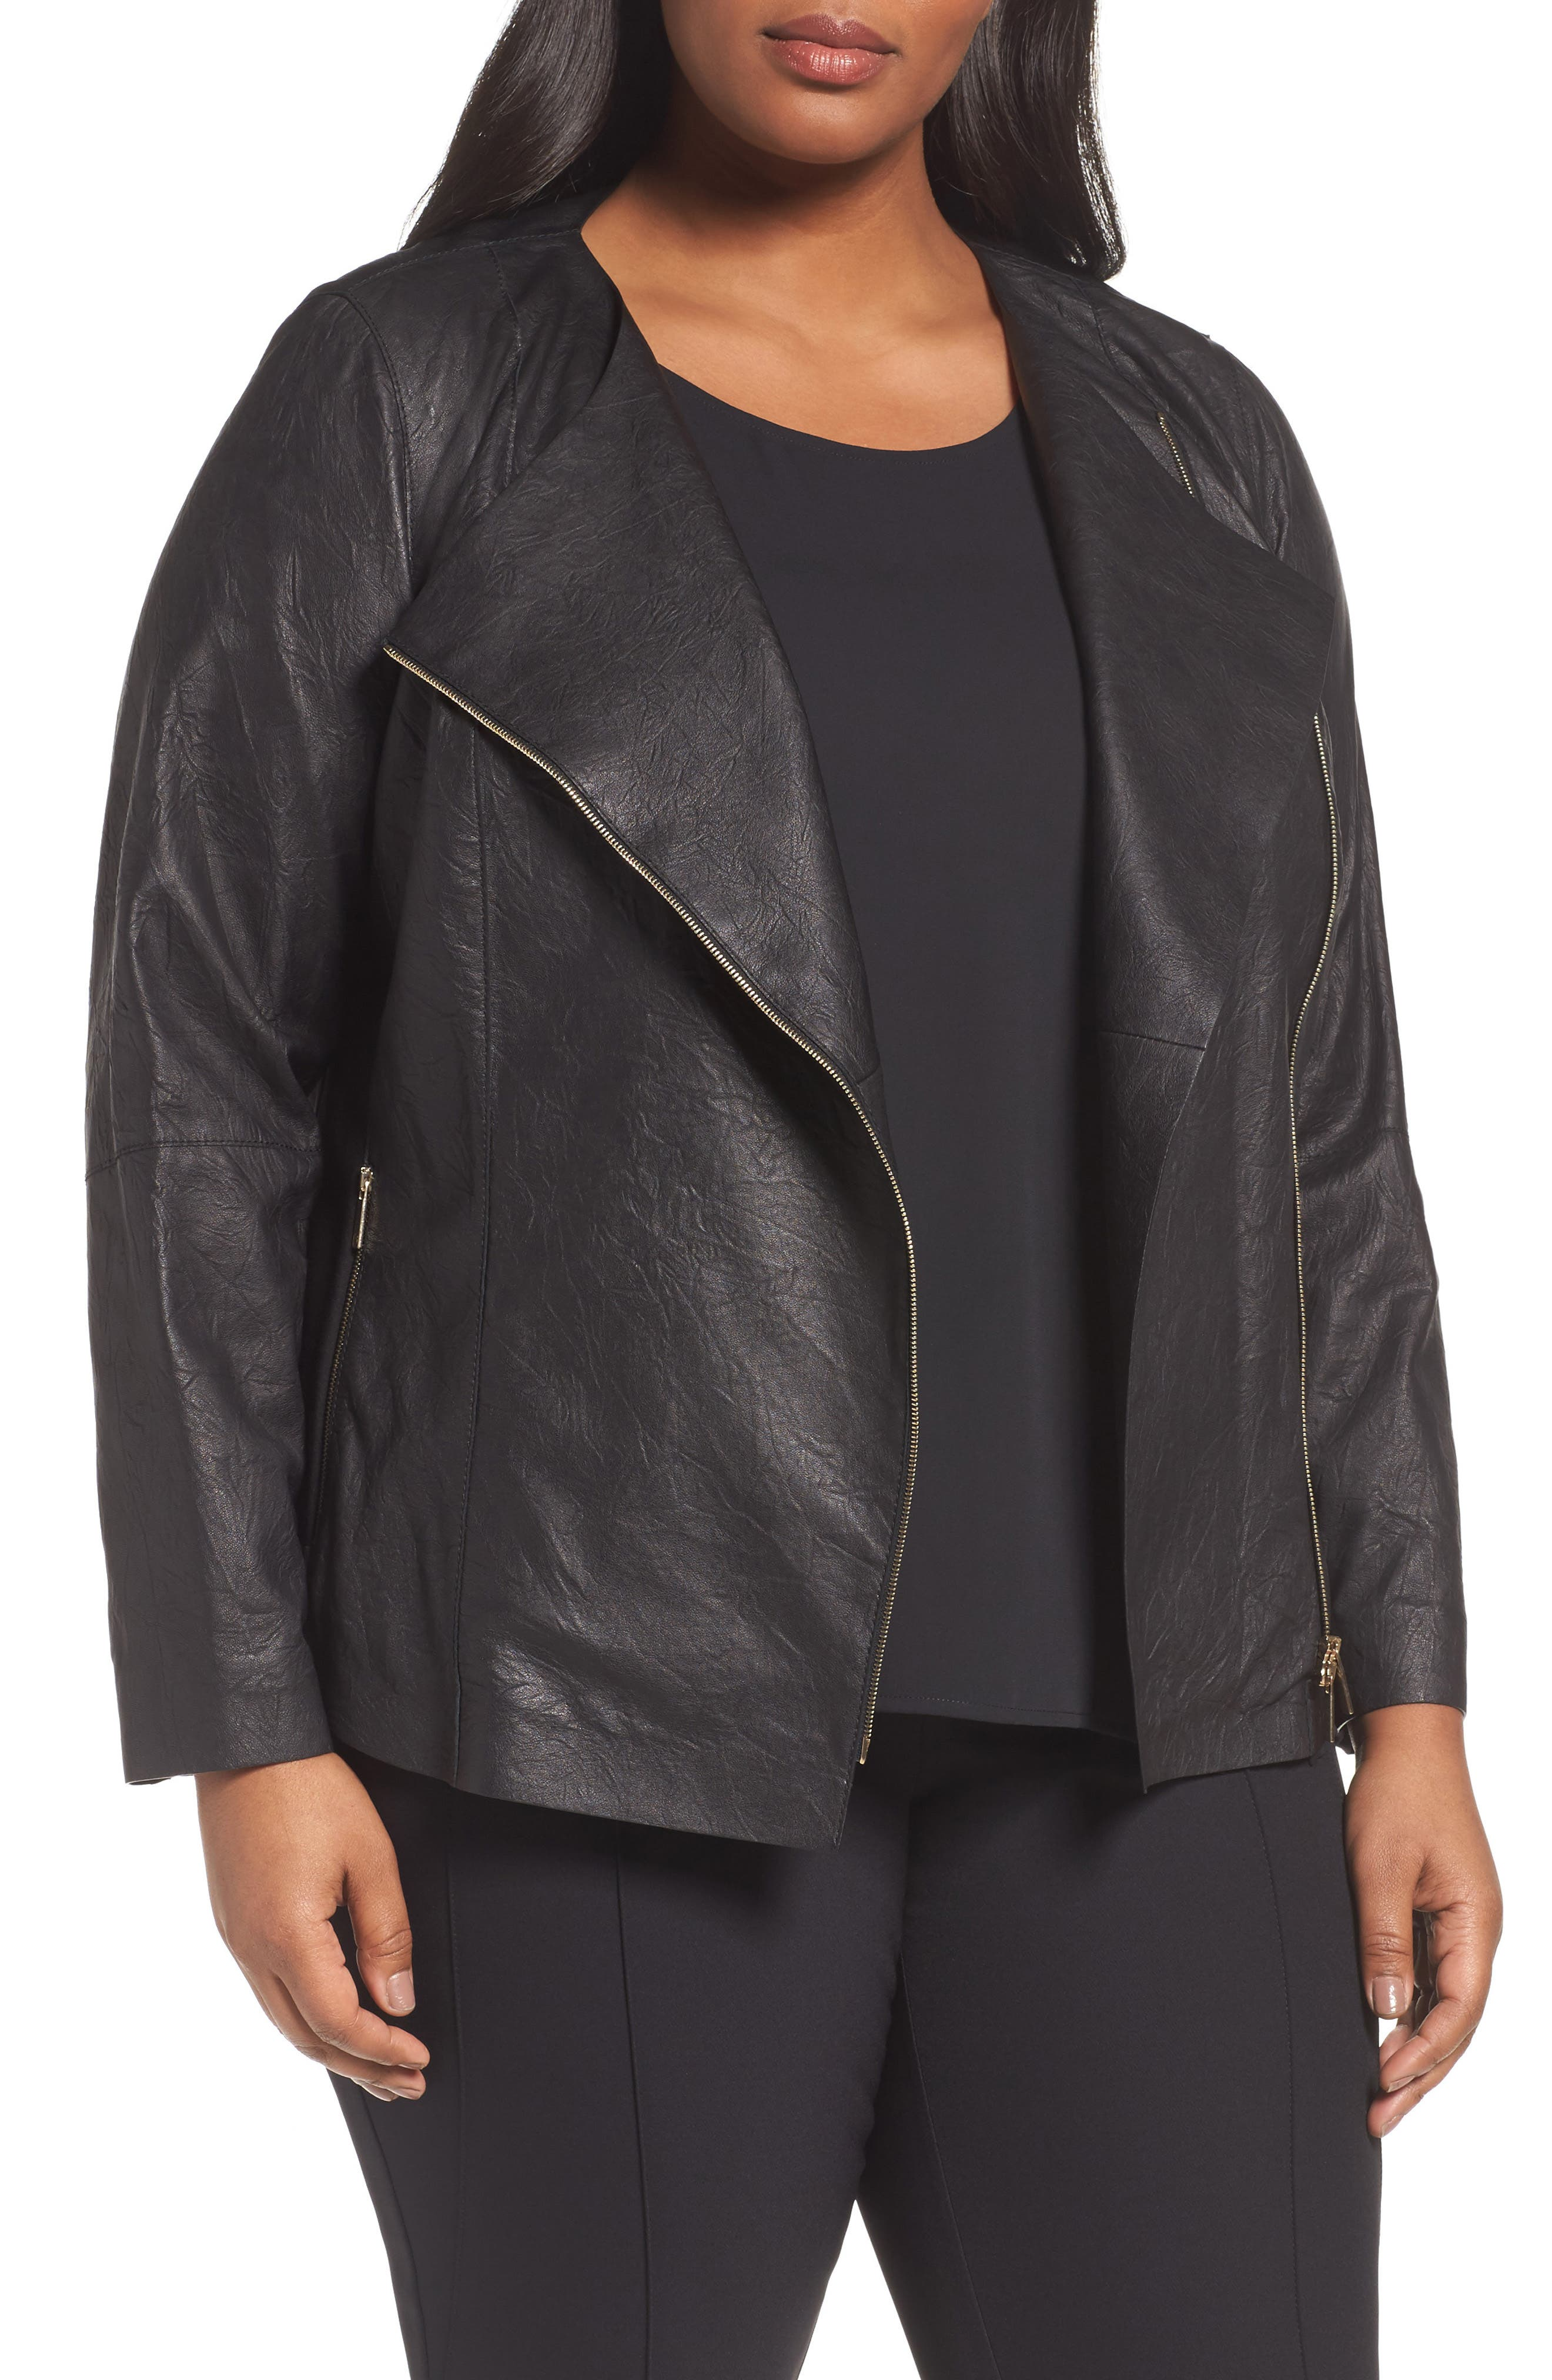 Aimes Leather Jacket,                         Main,                         color,